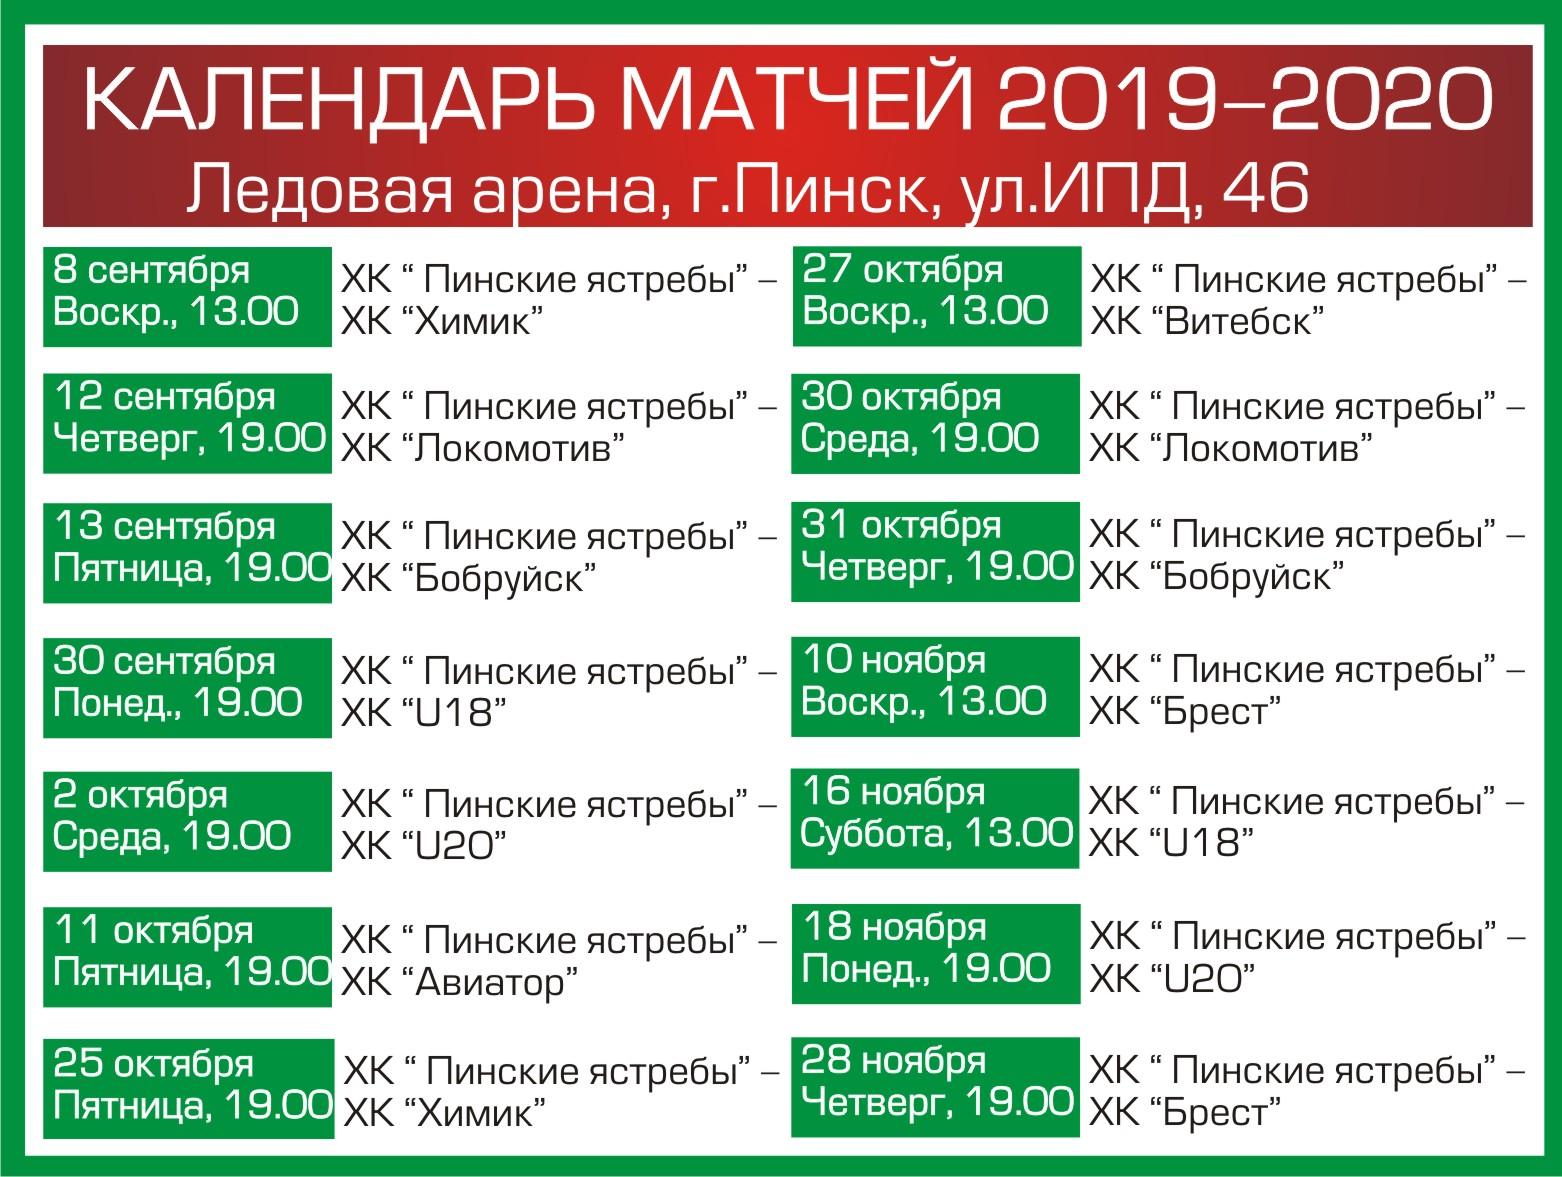 Календарь - фото